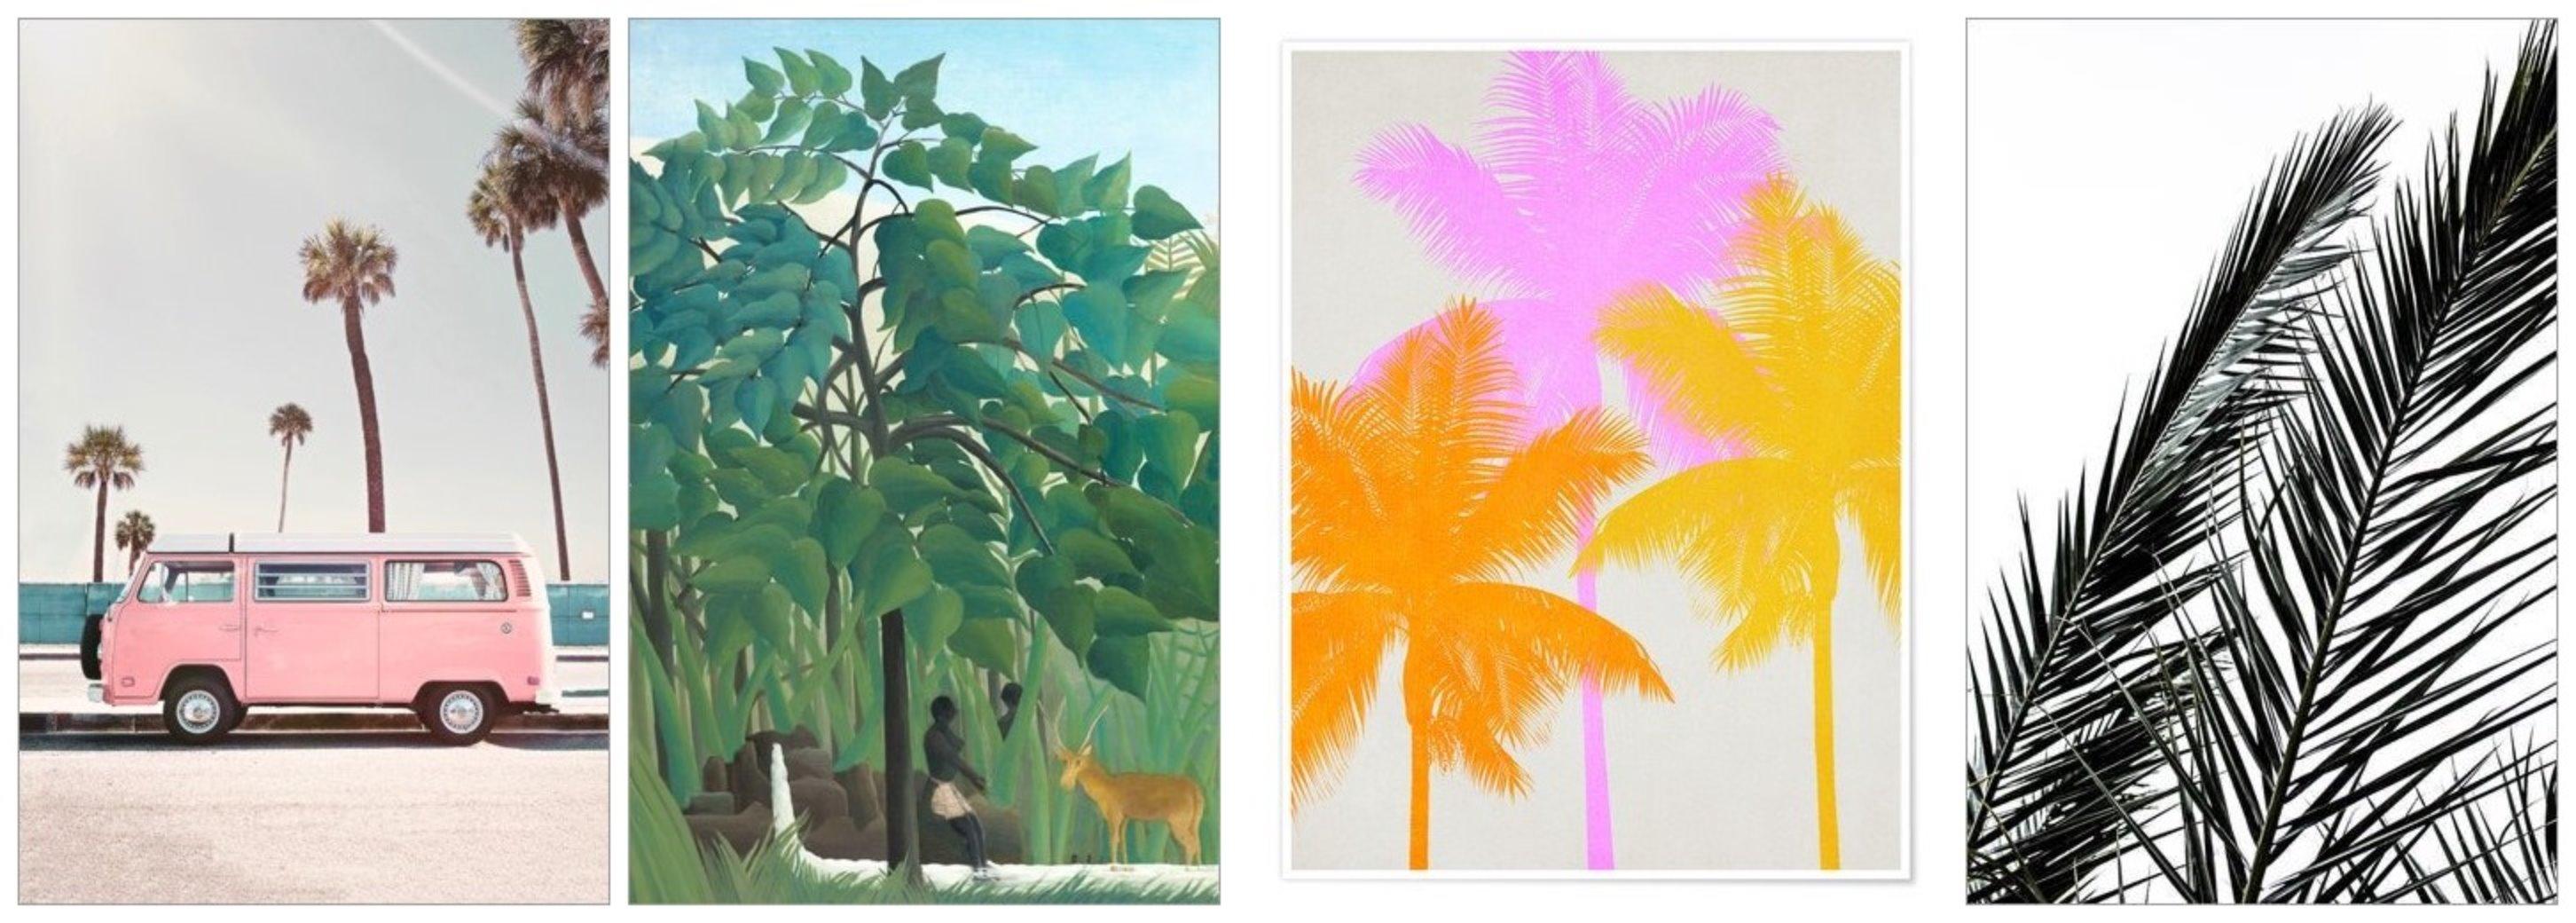 Posterlounge palmiers